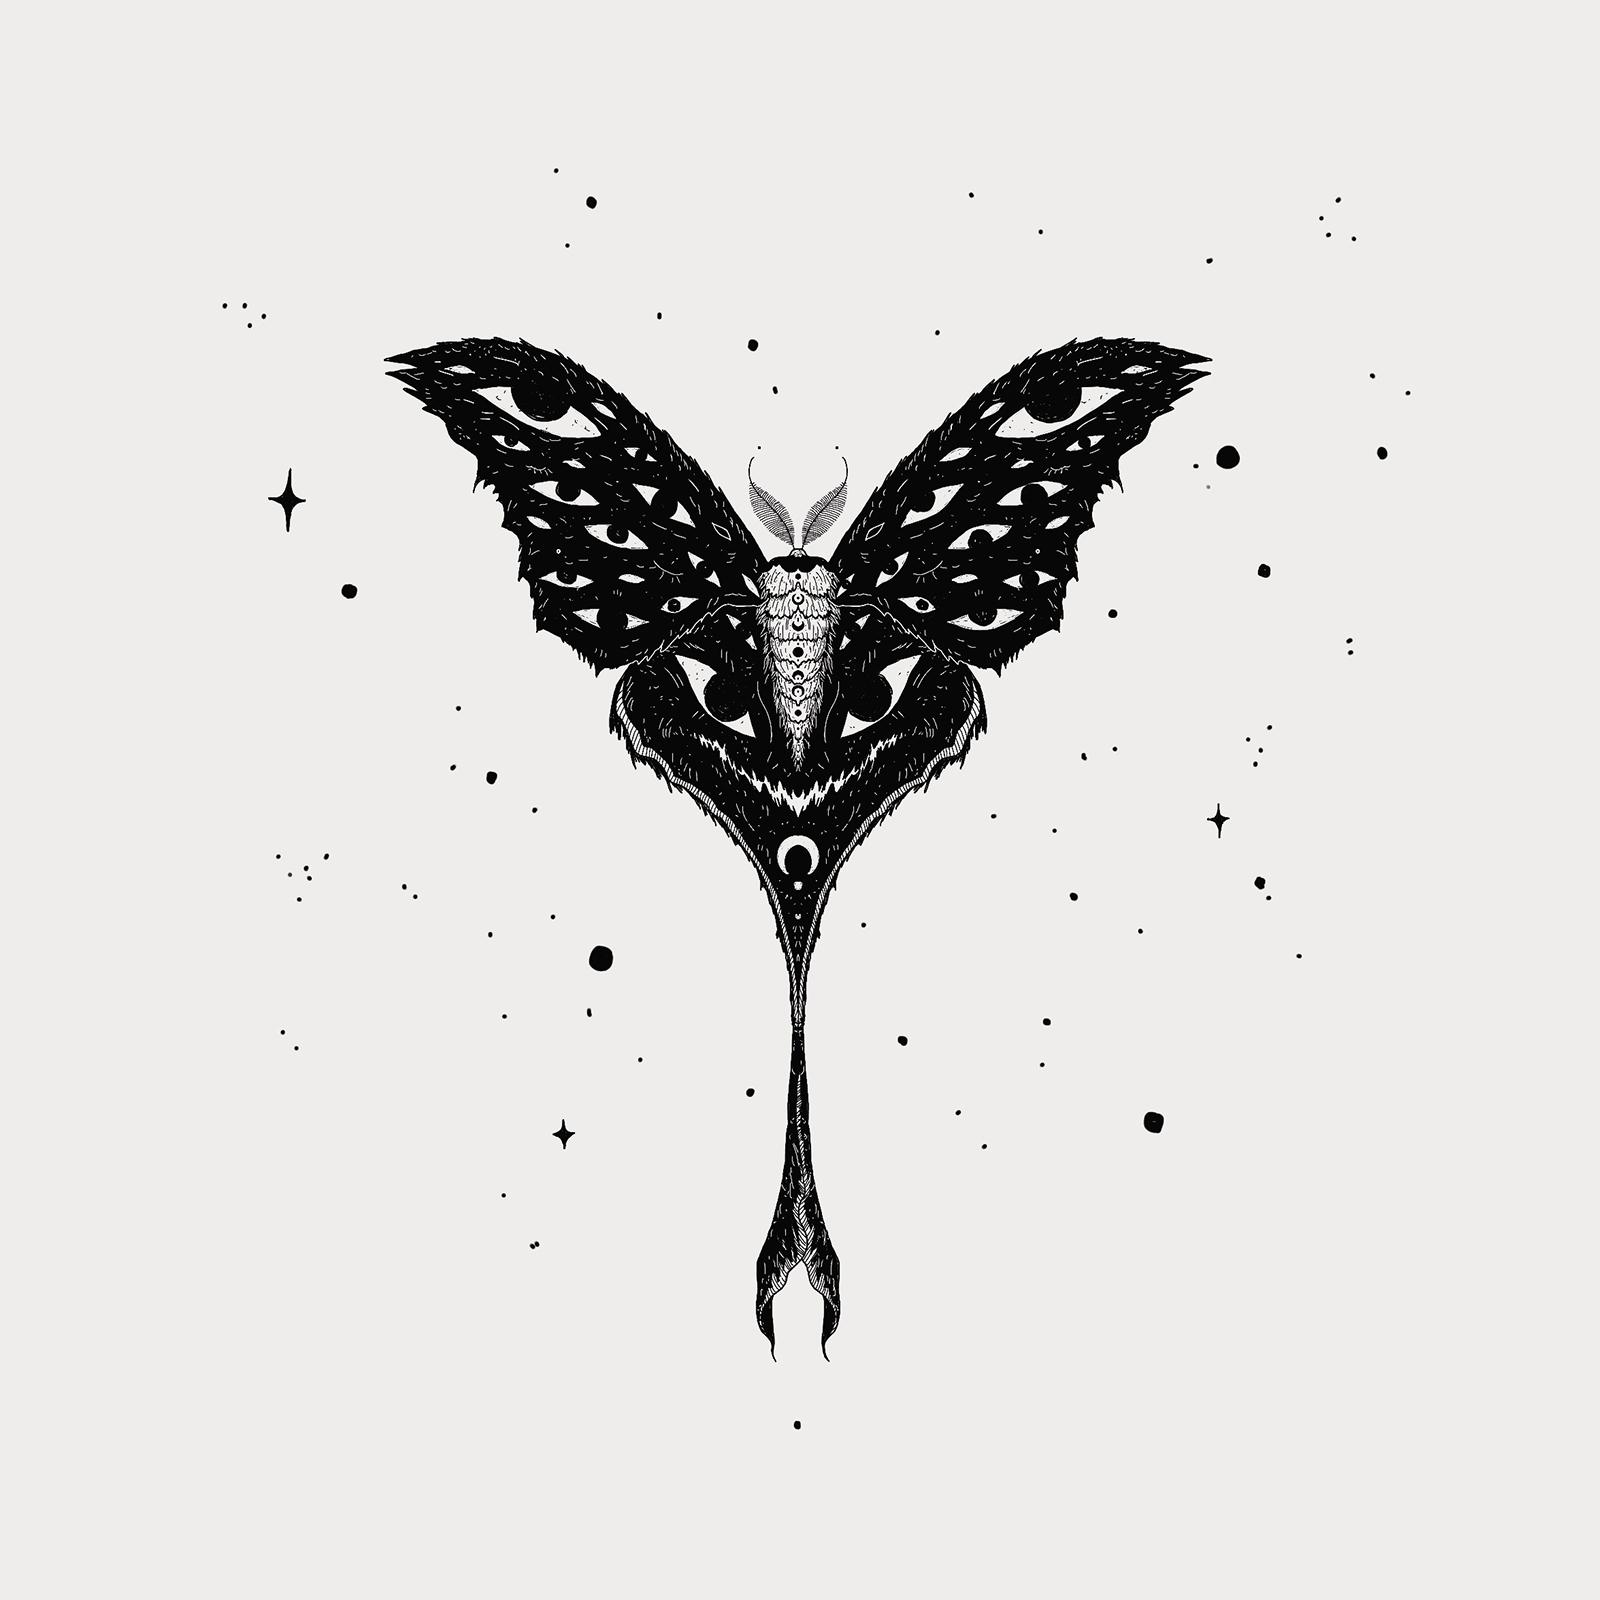 motheyes